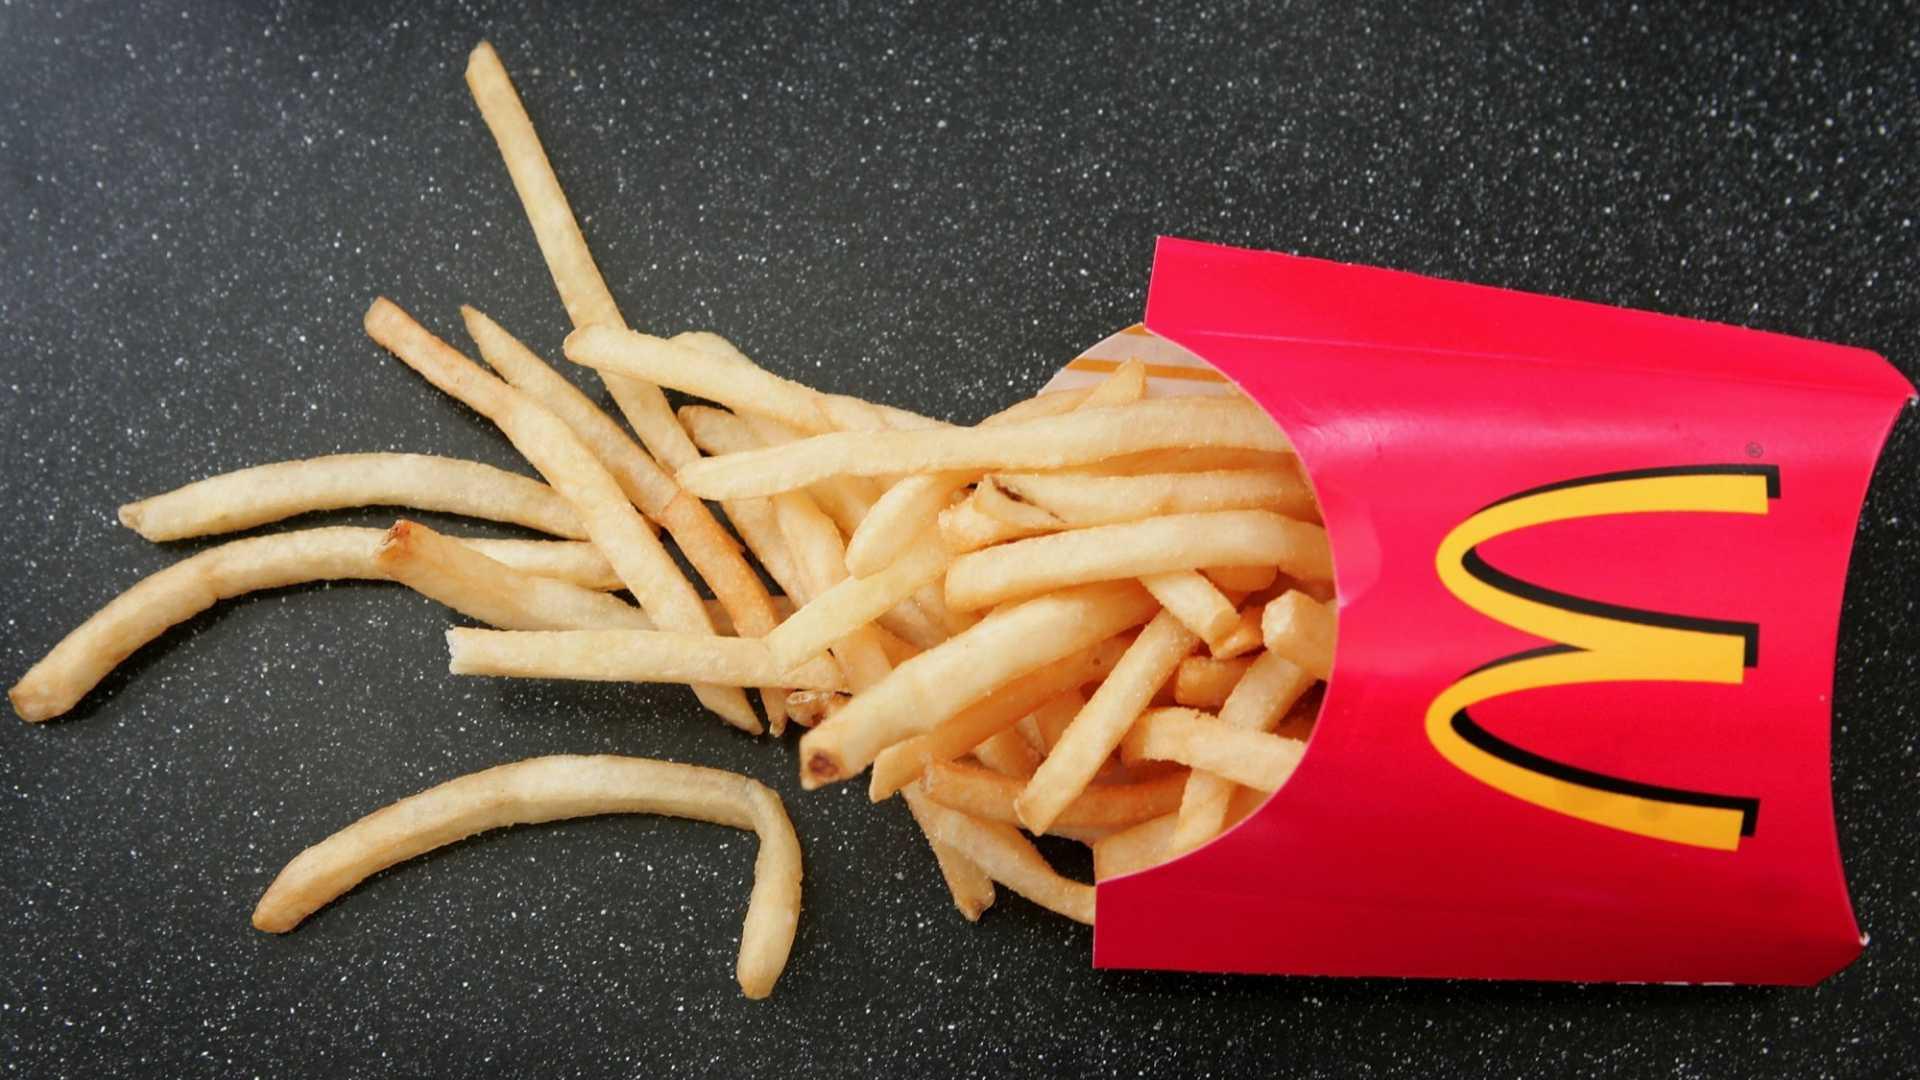 McDonald's has been posting historic low numbers.